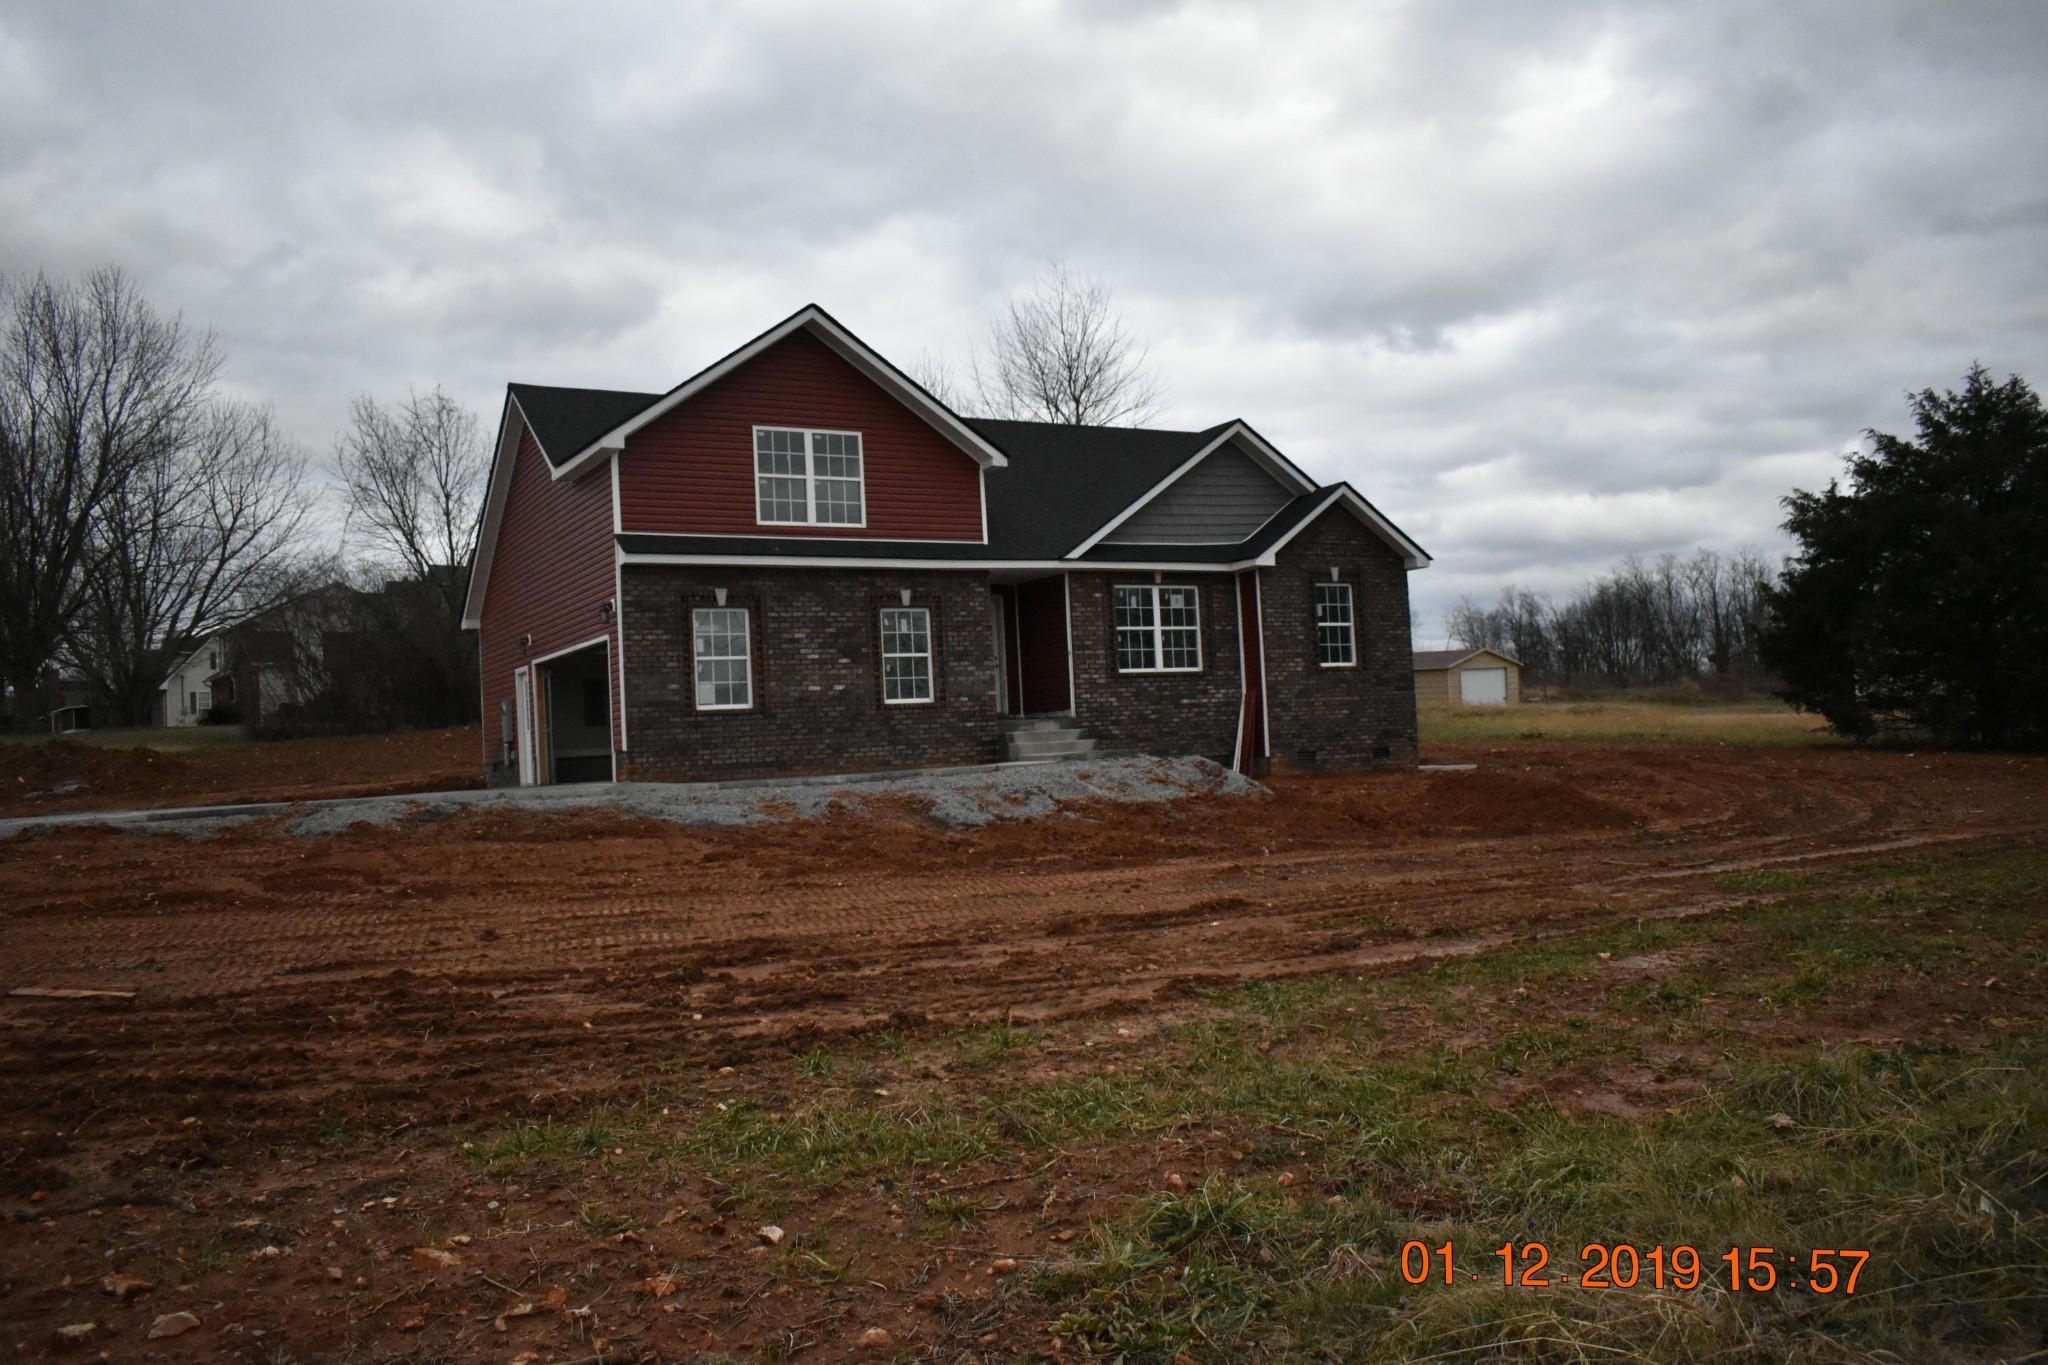 1 Wentworth, Oak Grove, KY 42262 - Oak Grove, KY real estate listing